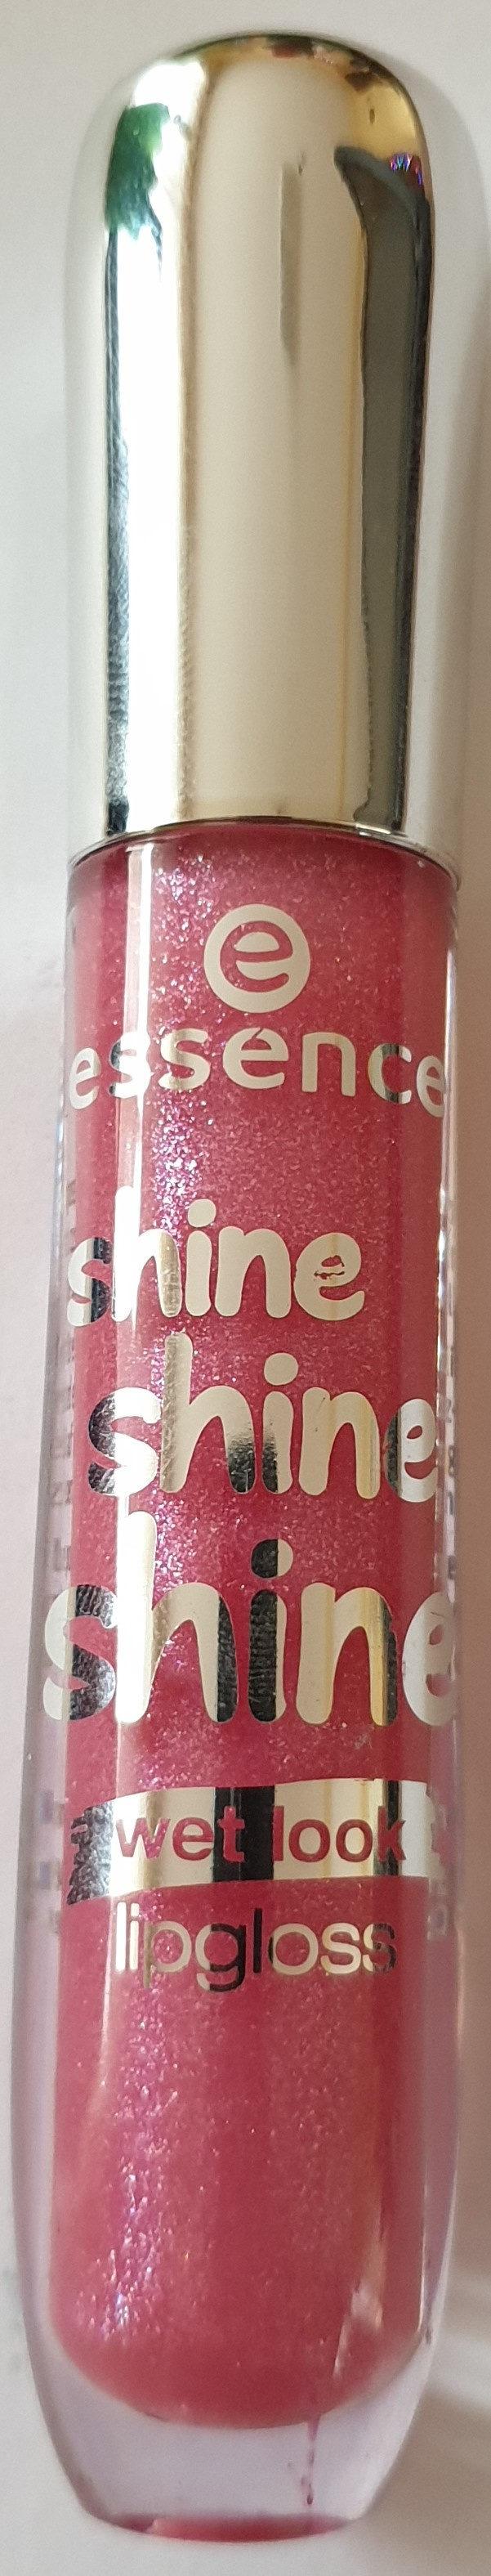 shine shine shine wetlook lipgloss 03 friends of glamour - Product